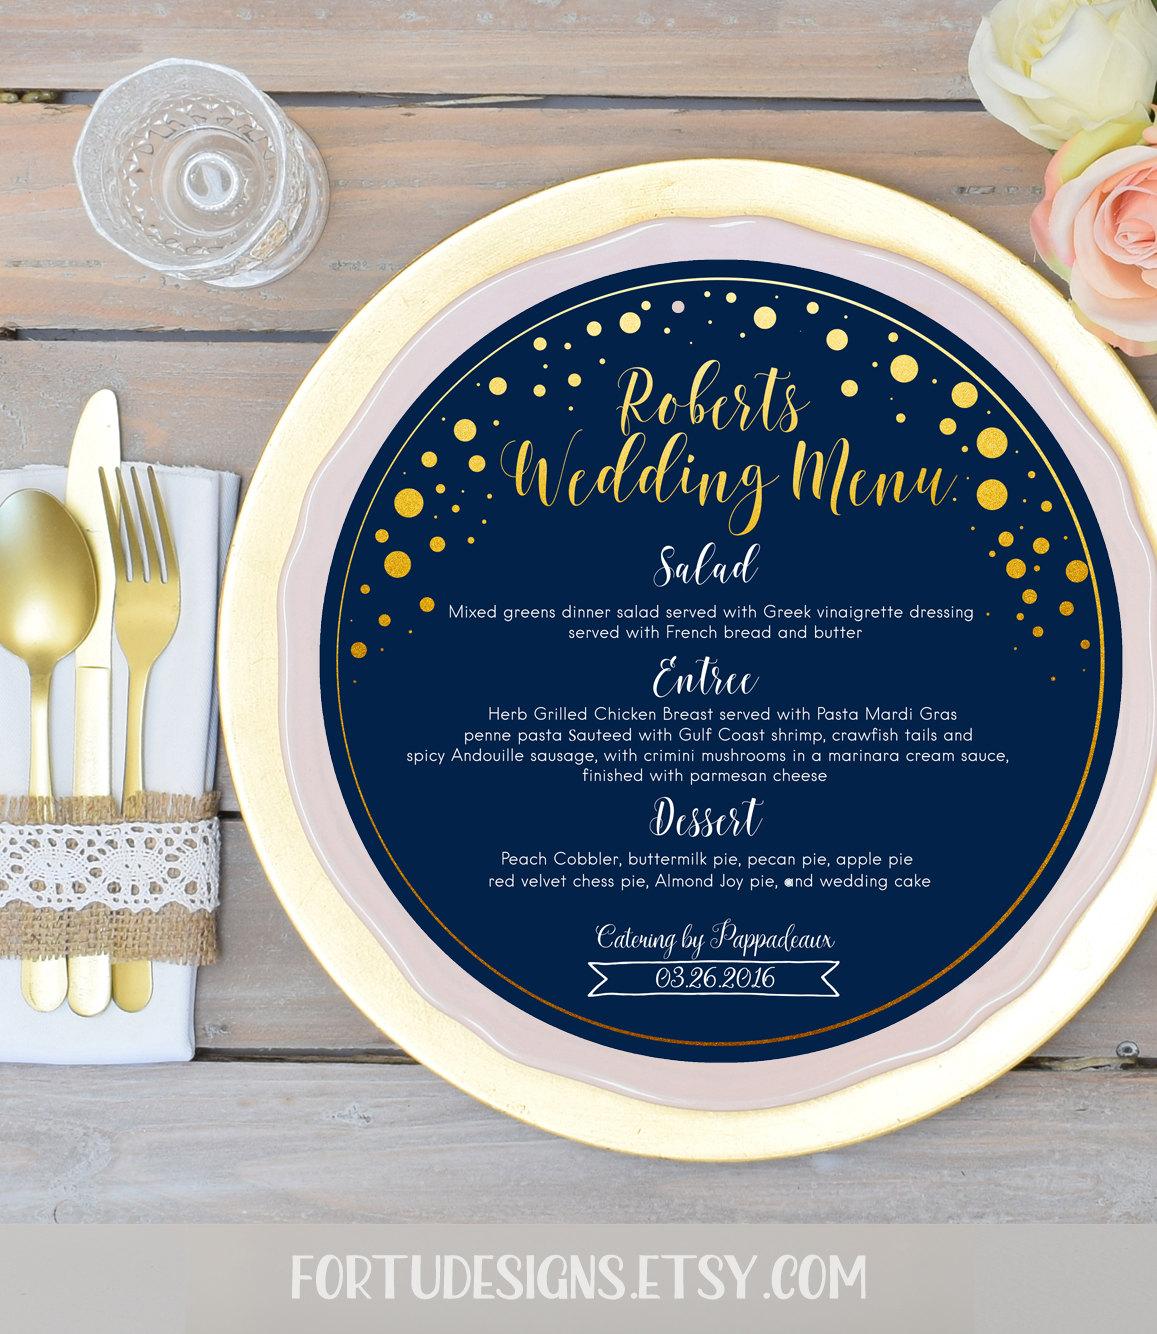 gradient gold circles wedding menu example